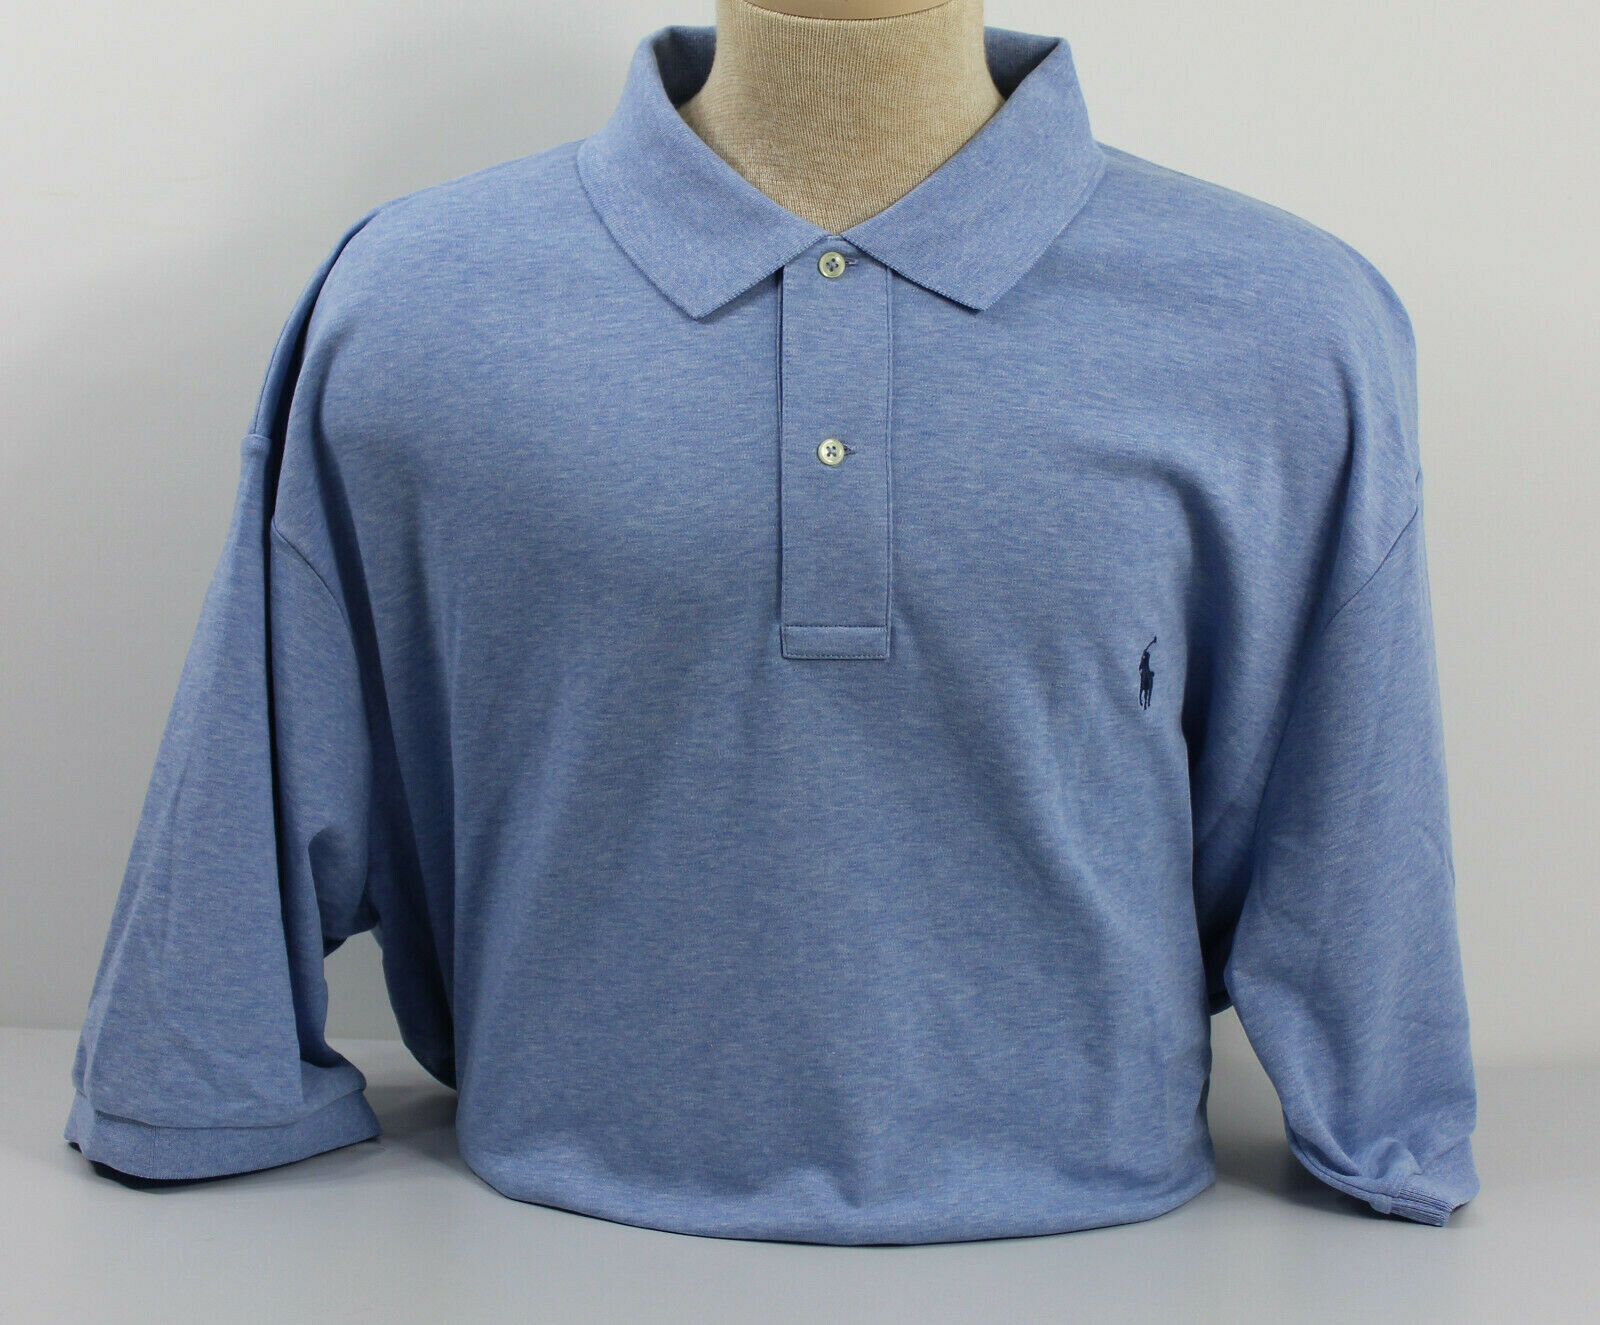 Polo Ralph Lauren Mens Shirt bluee Navy 3XB Cotton Jamaica Pony